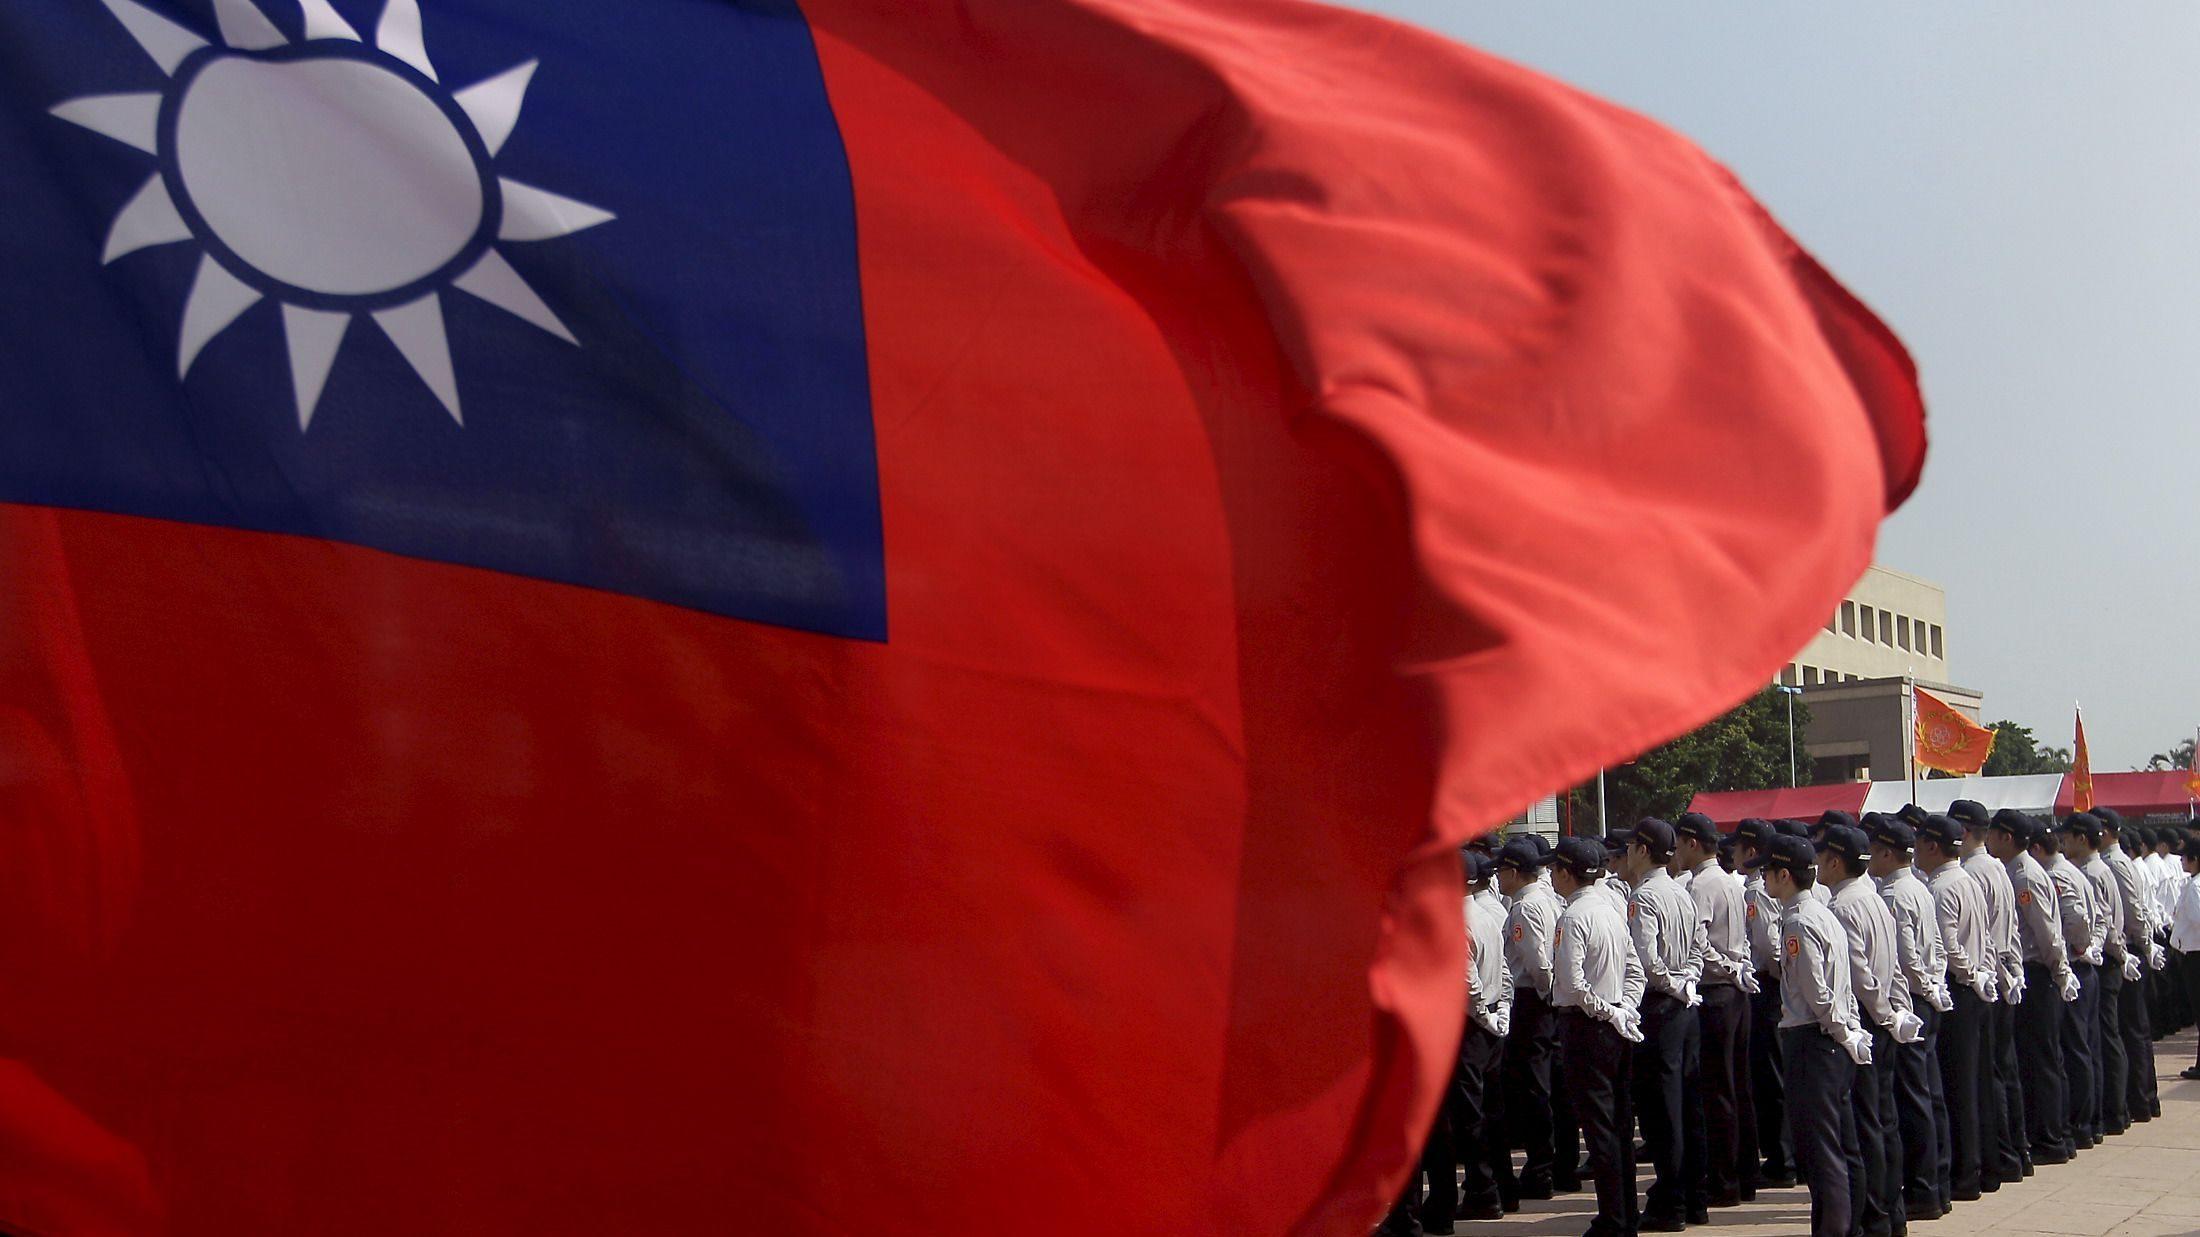 Apple bows to China by censoring Taiwan flag emoji